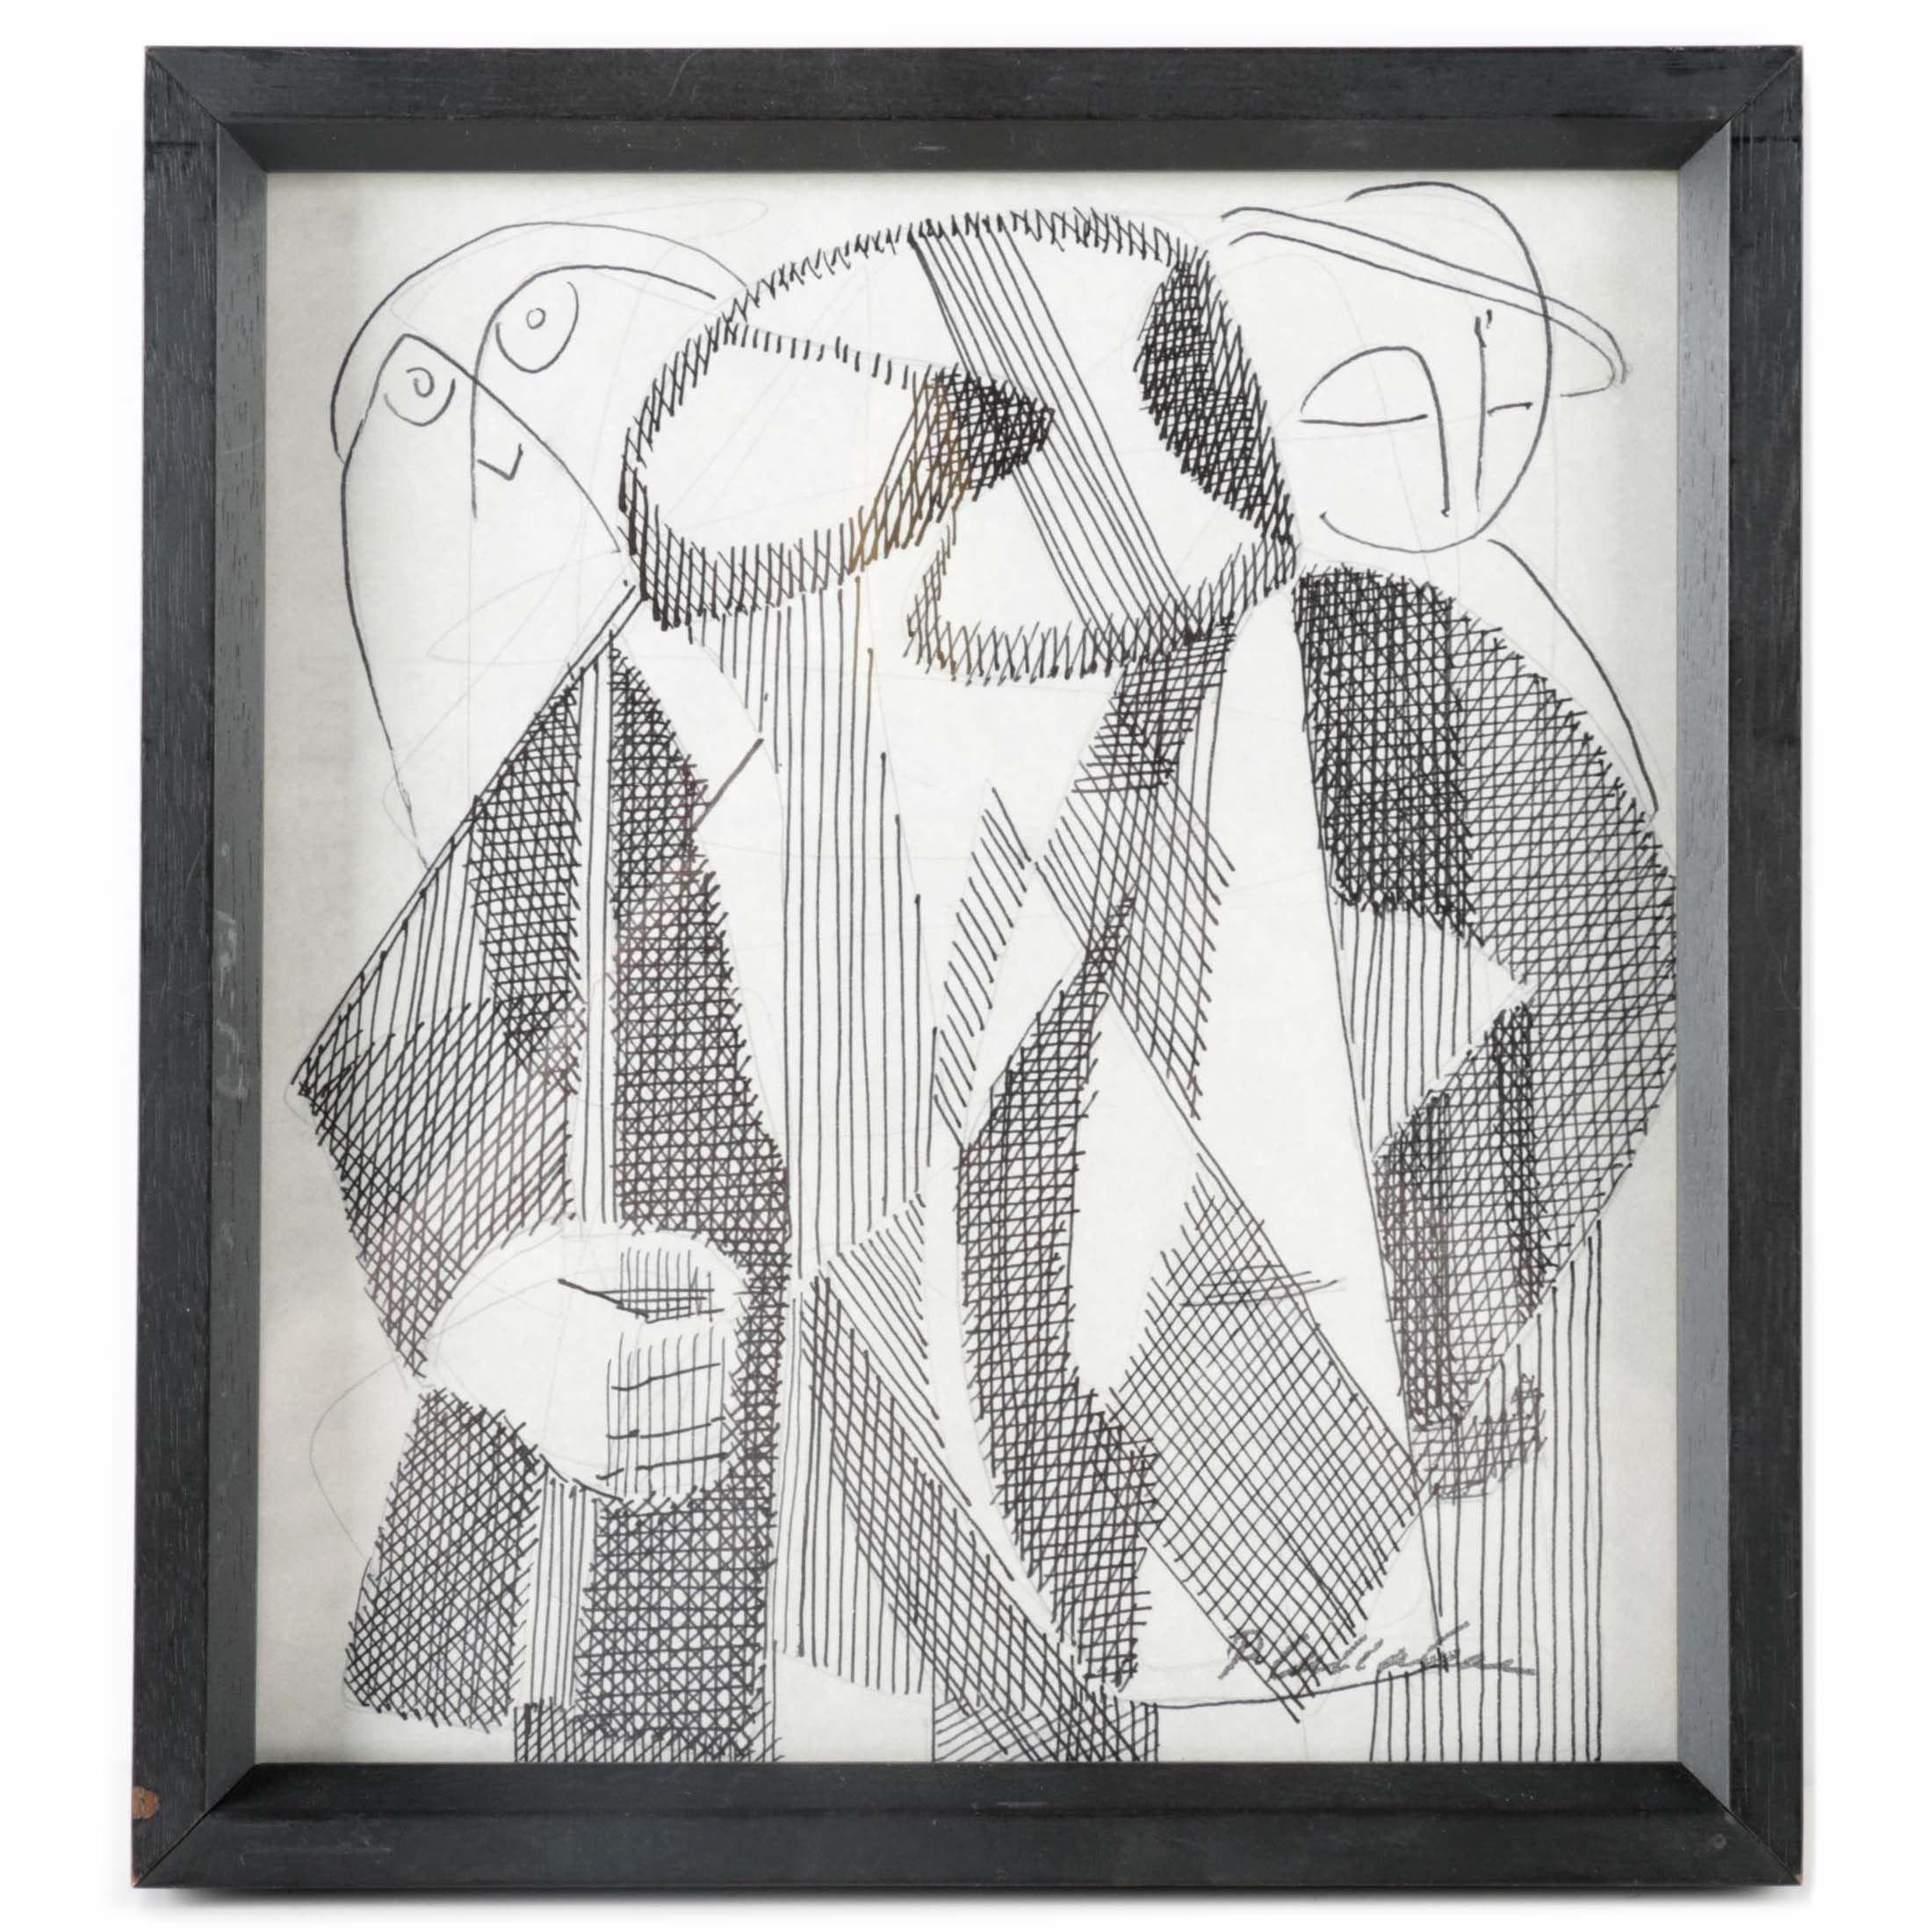 Phillip Callahan Original Ink Drawing of Abstract Figures